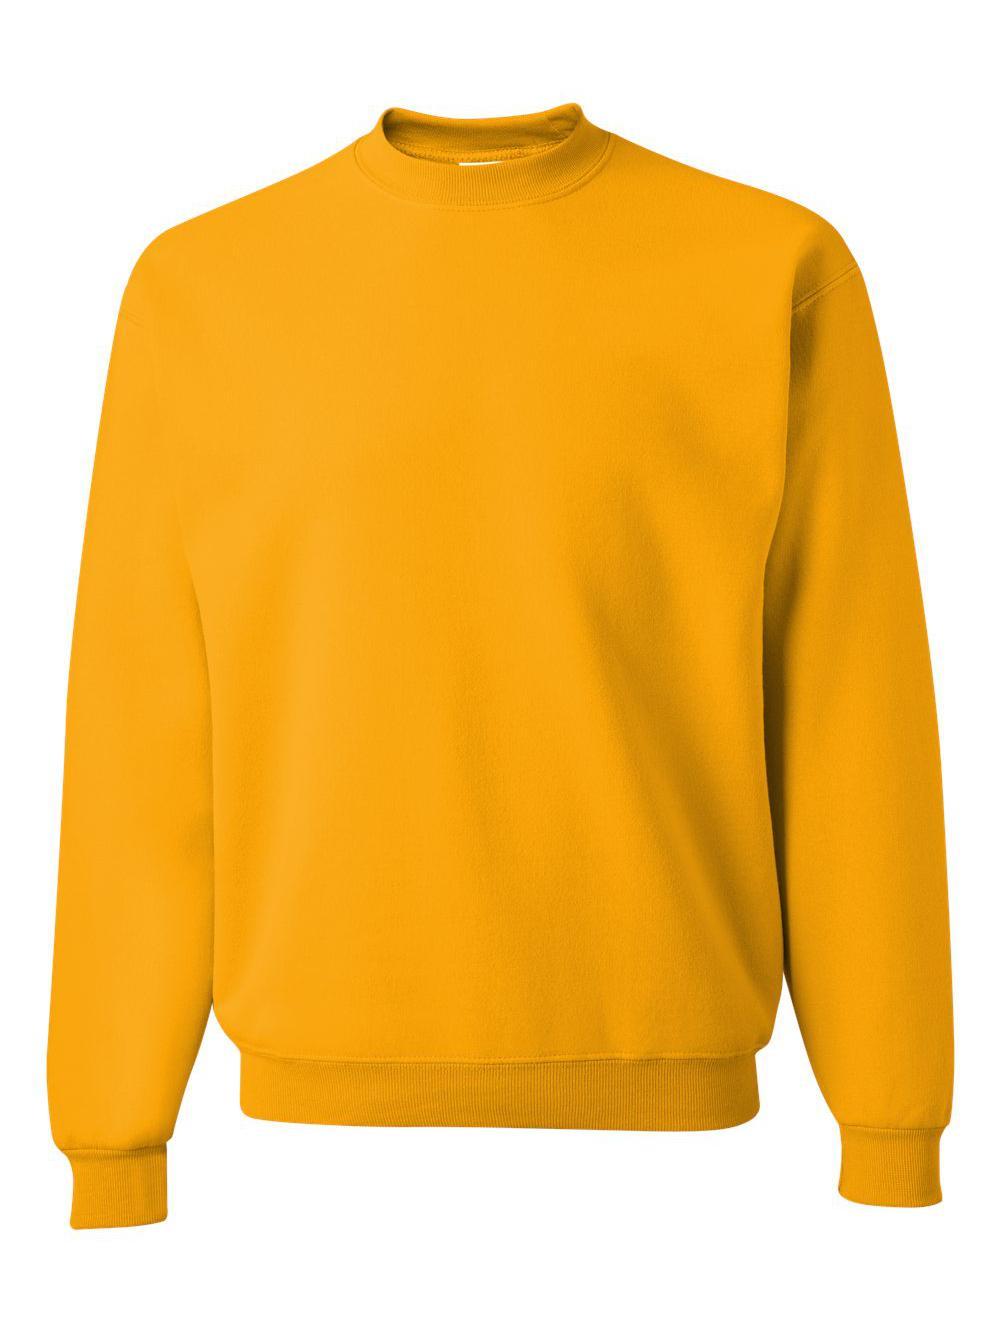 Jerzees-NuBlend-Crewneck-Sweatshirt-562MR thumbnail 42